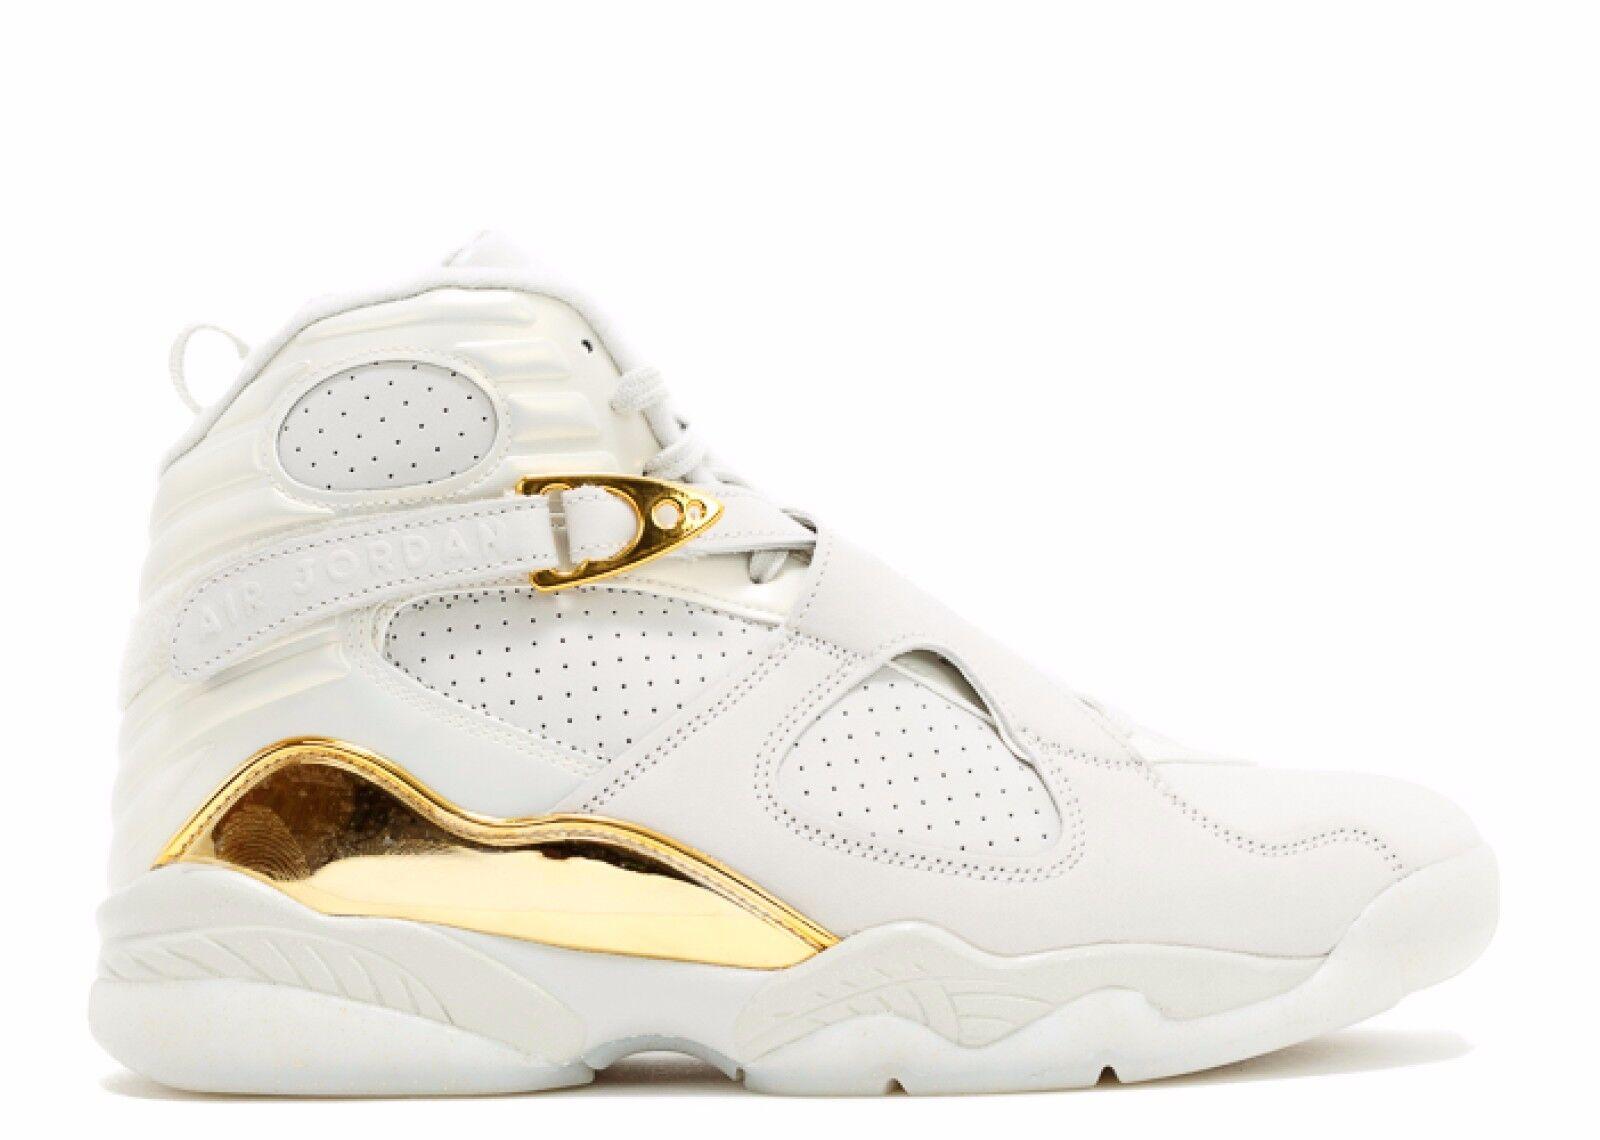 Air Jordan 8 Retro C & C Champagne/ Ivory White